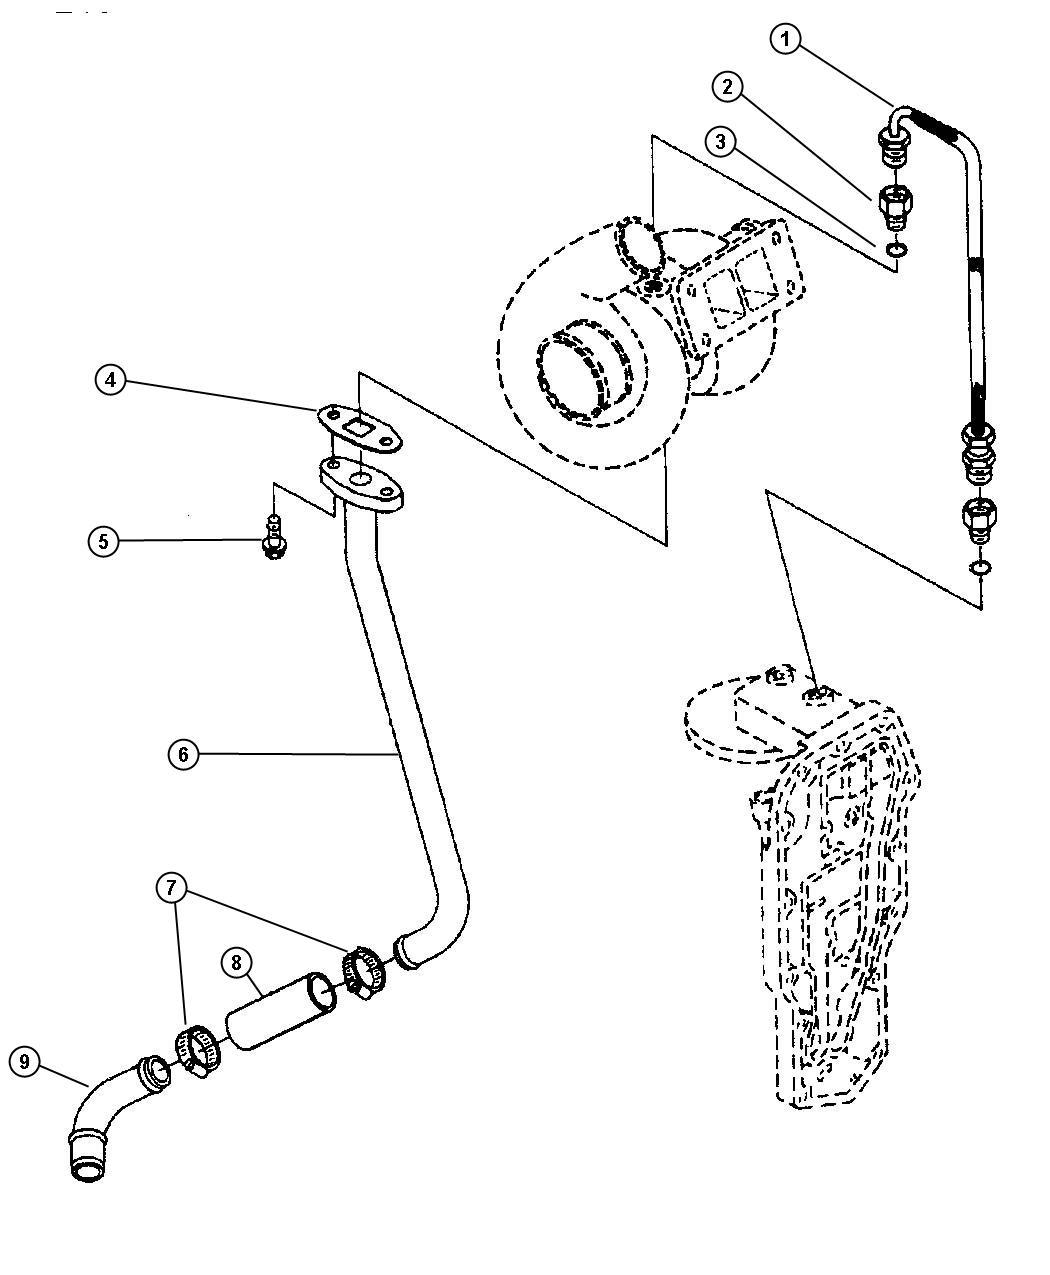 1999 Dodge Neon Connector  Turbo Oil Plumbing  Emissions  Diesel  Engine